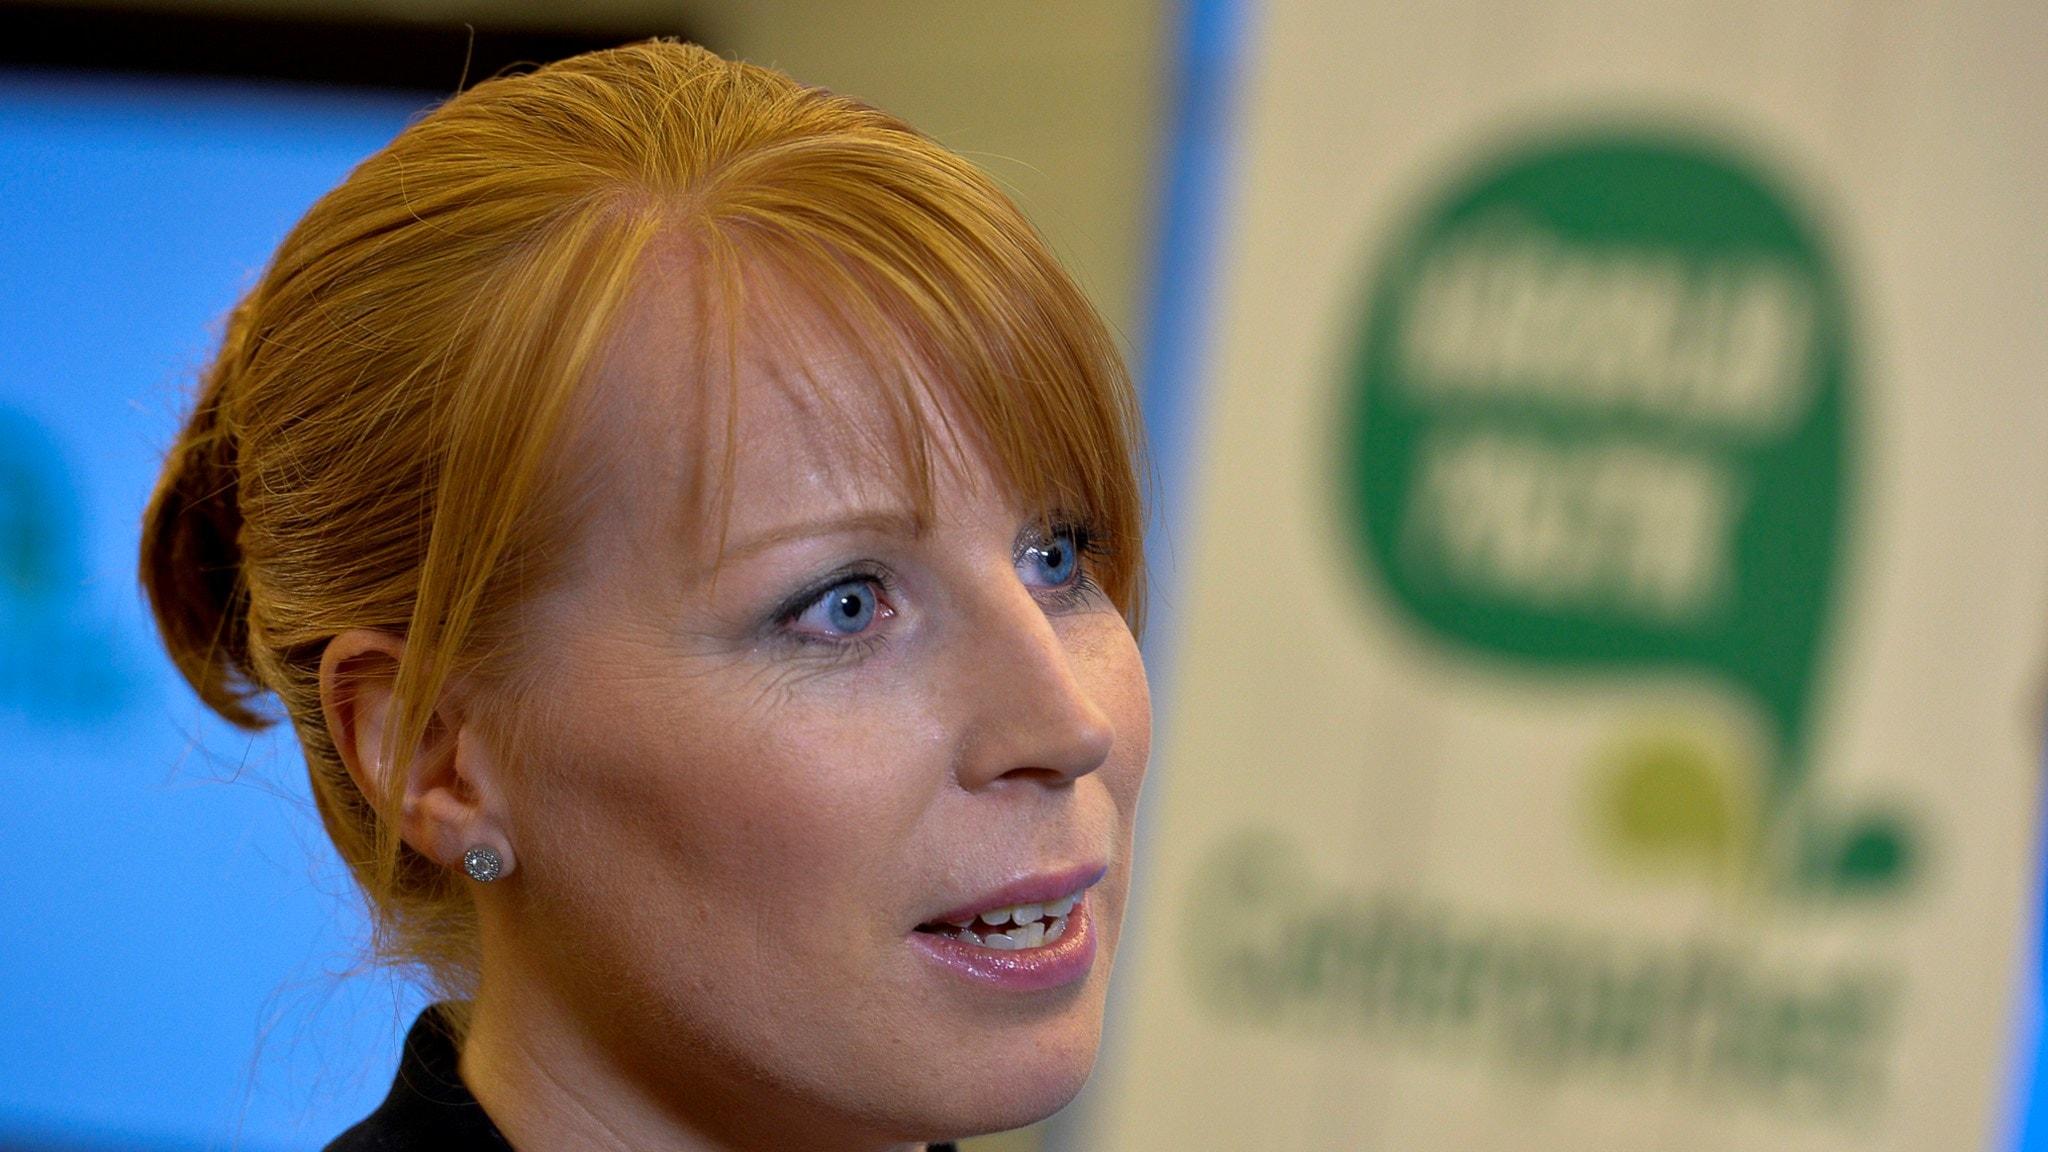 Är centern alliansens flyktingliberala röst, Annie Lööf?